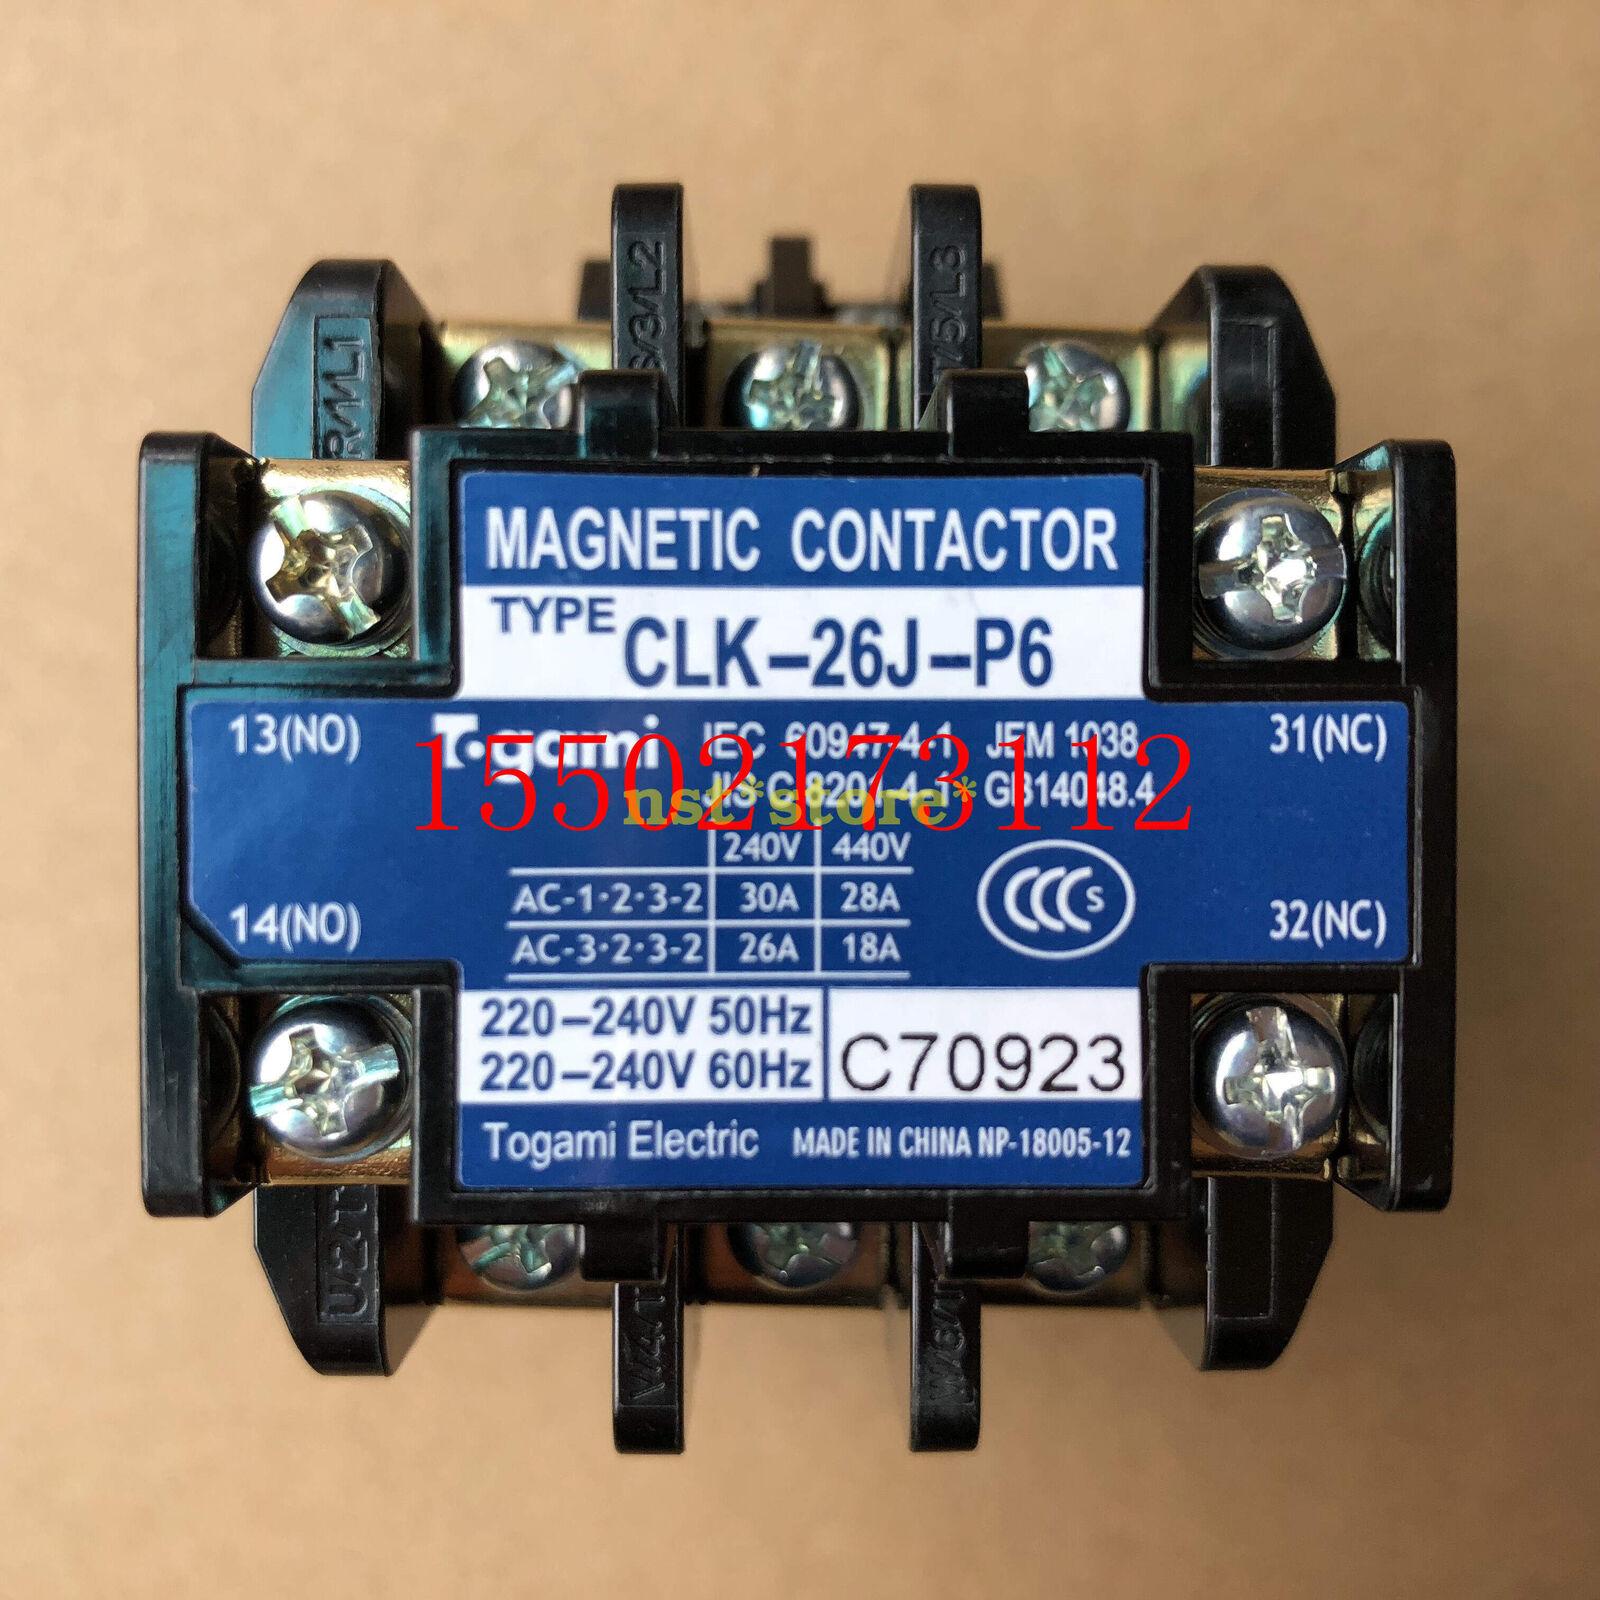 1PCS for DAIKIN CLK-26J-P6 220V alternating current contactor